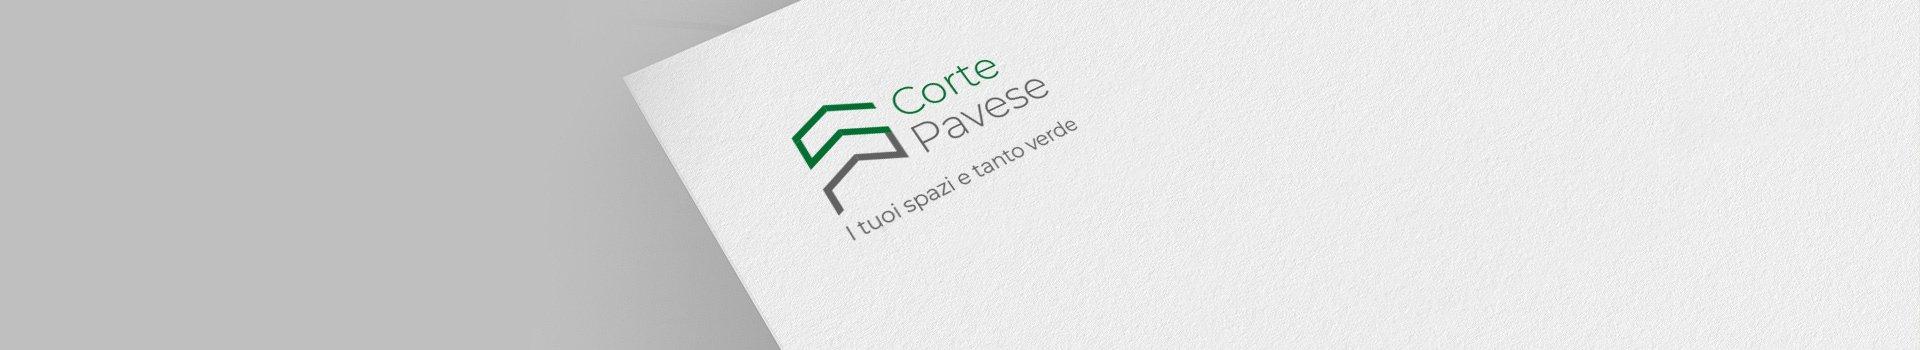 Header Corte Pavese